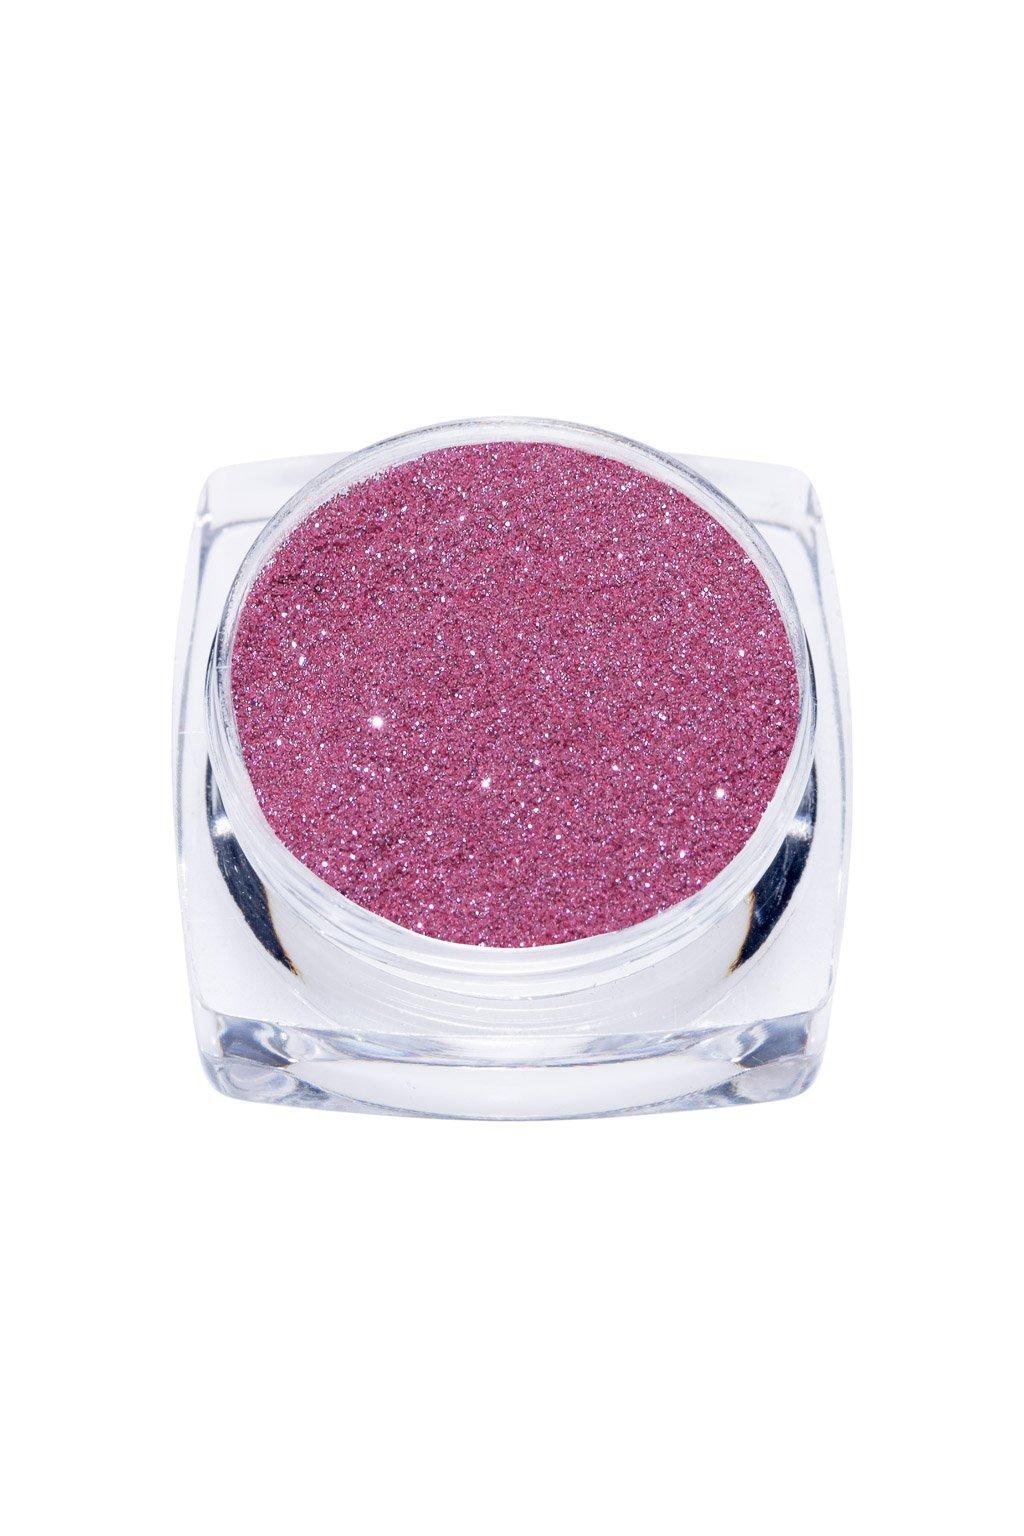 23462 trpyt powder pink